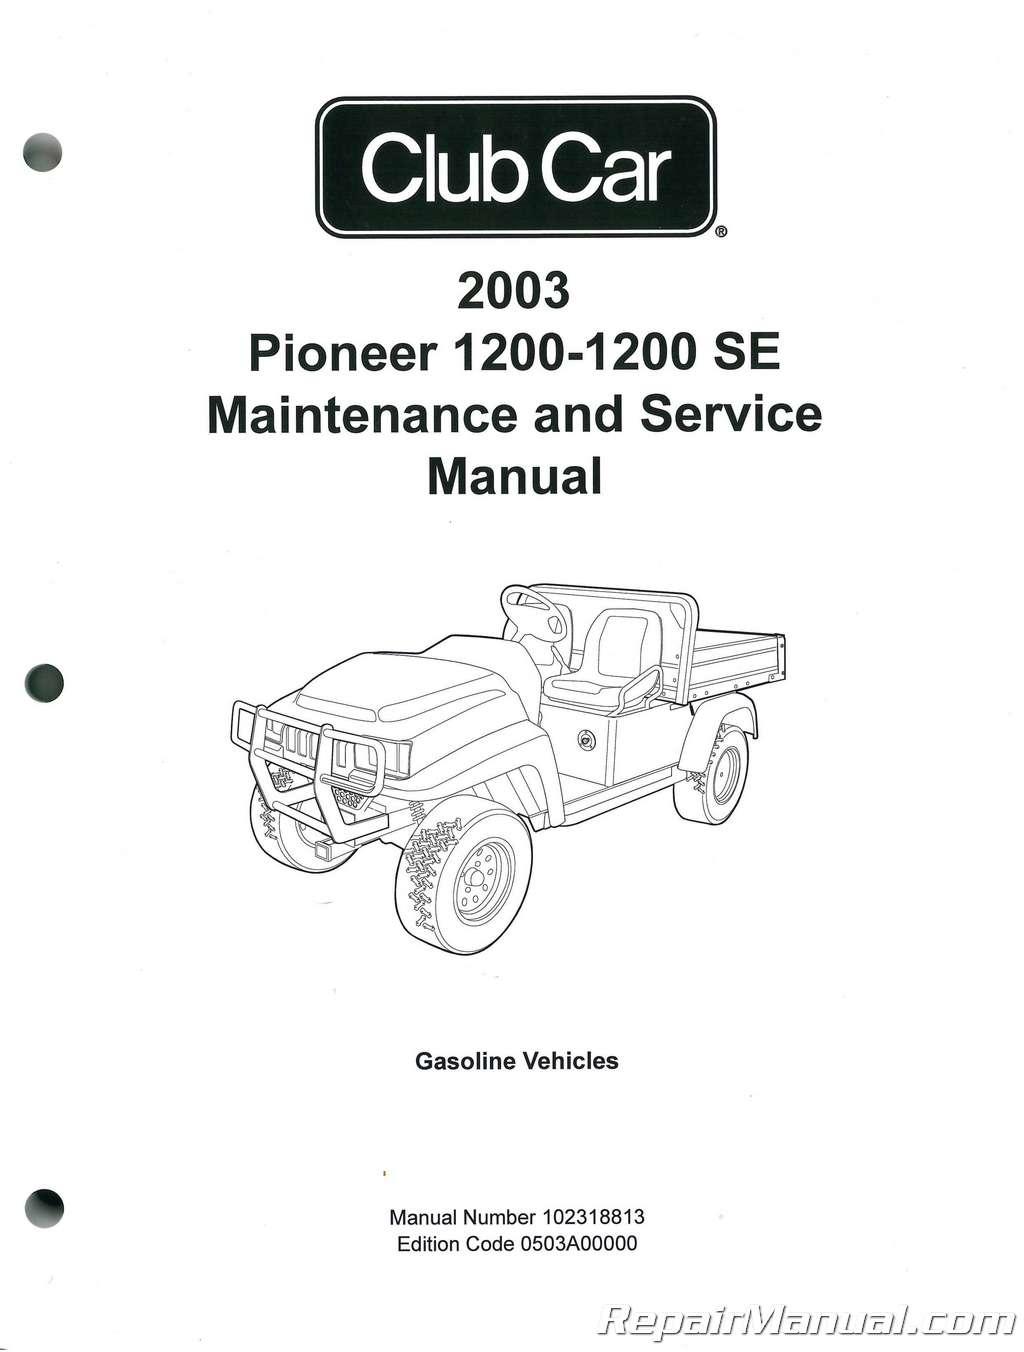 2003 club car pioneer 1200 1200se service maintenance manual